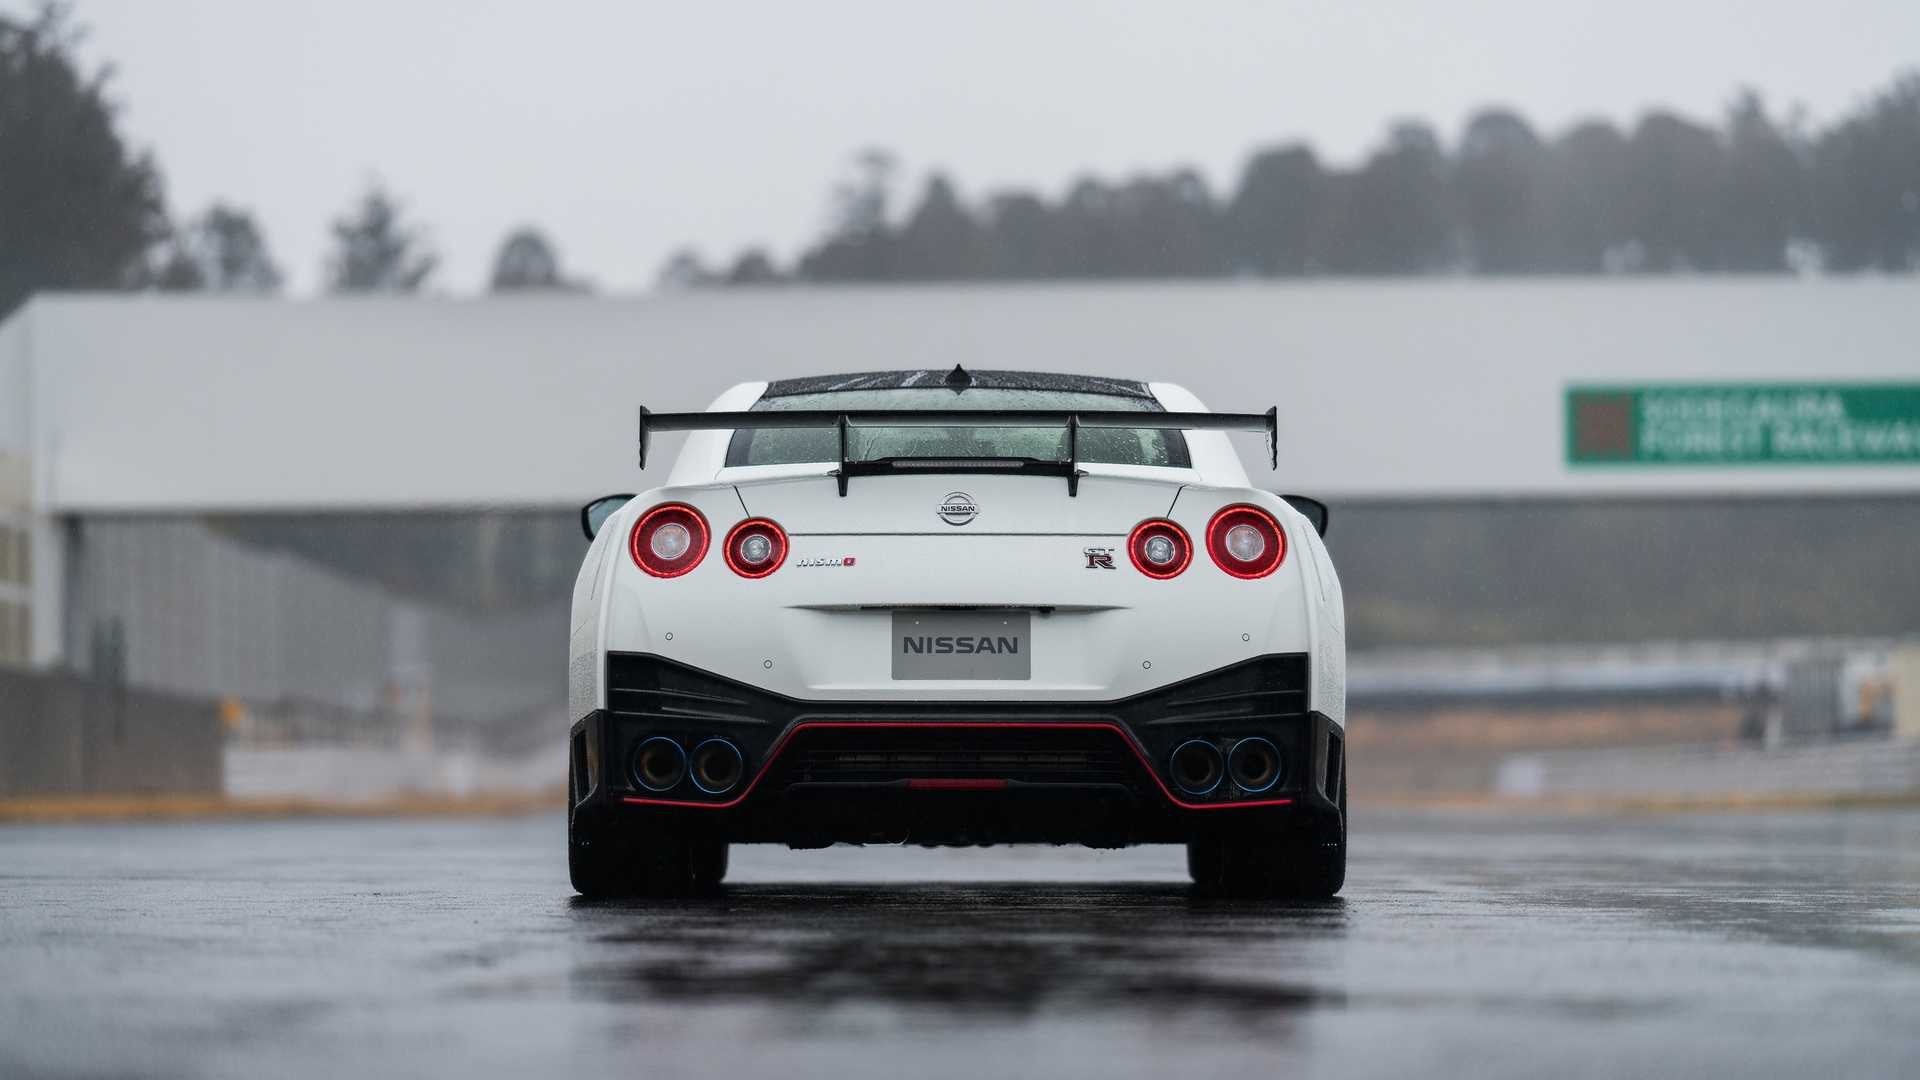 2020 Nissan GT-R NISMO Rear Wallpaper (8)